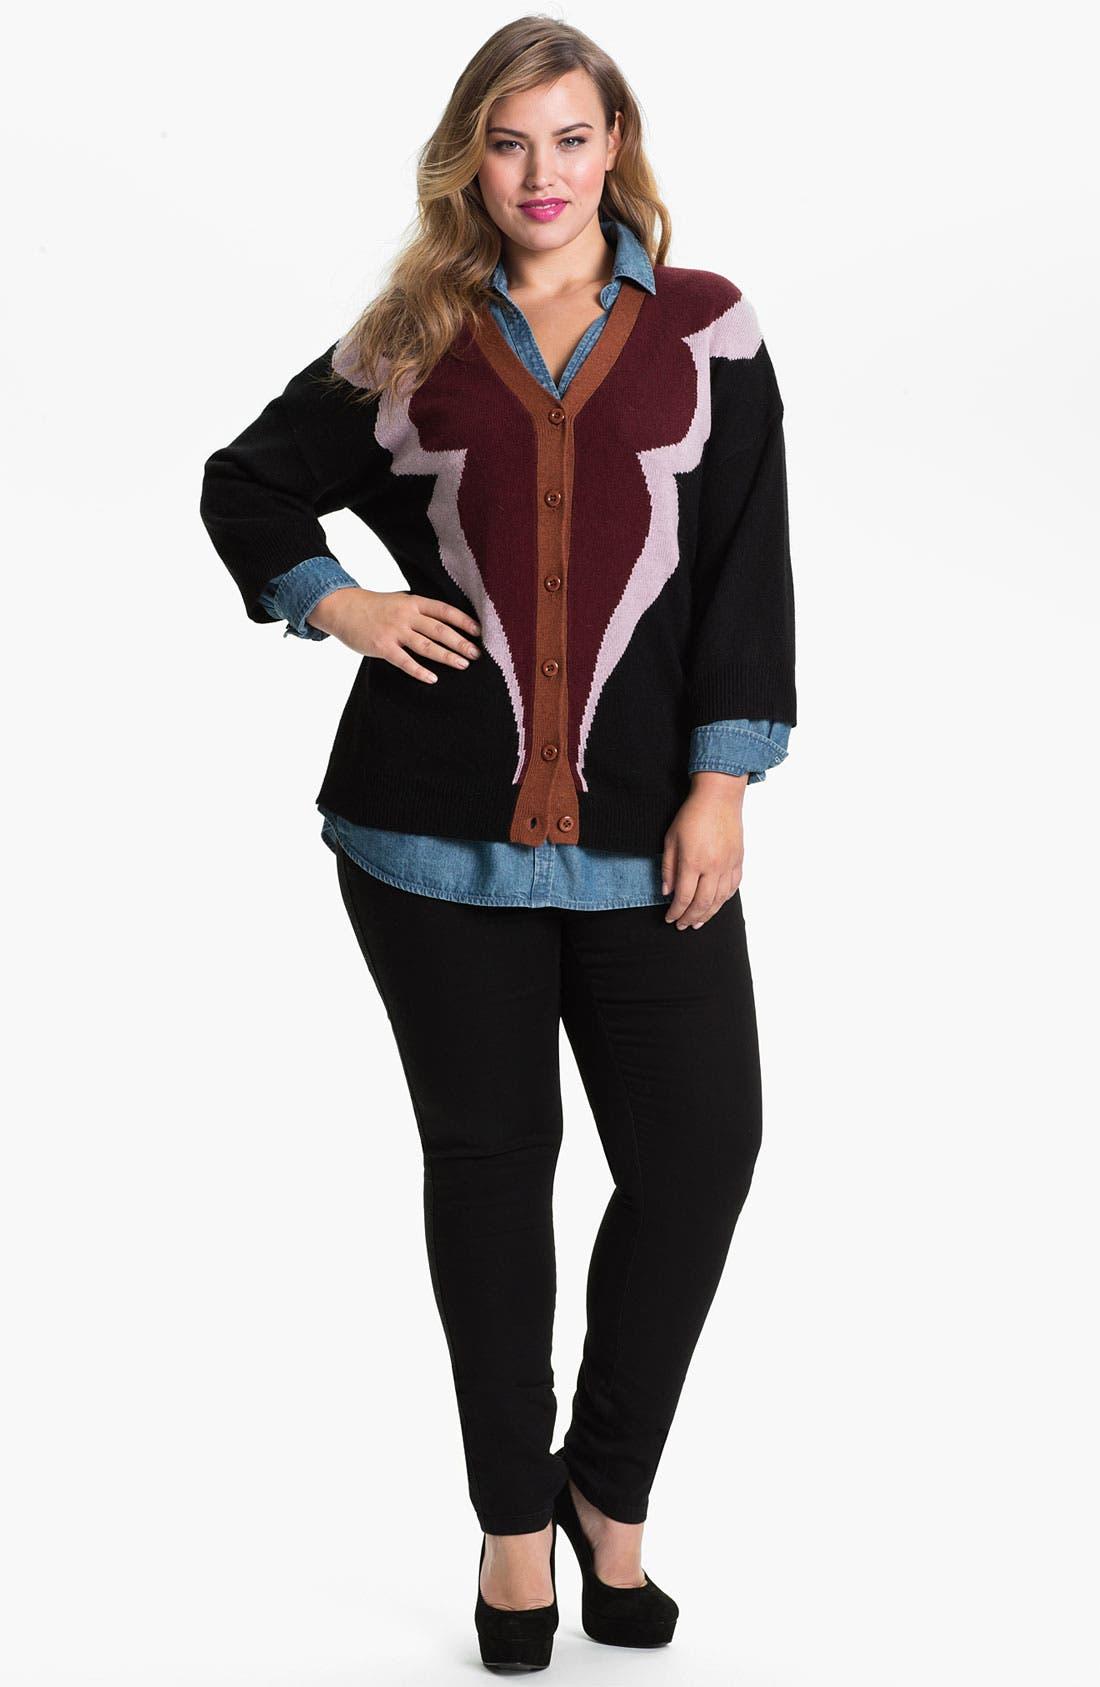 Alternate Image 1 Selected - Evans 'Clover' Cardigan (Plus Size)